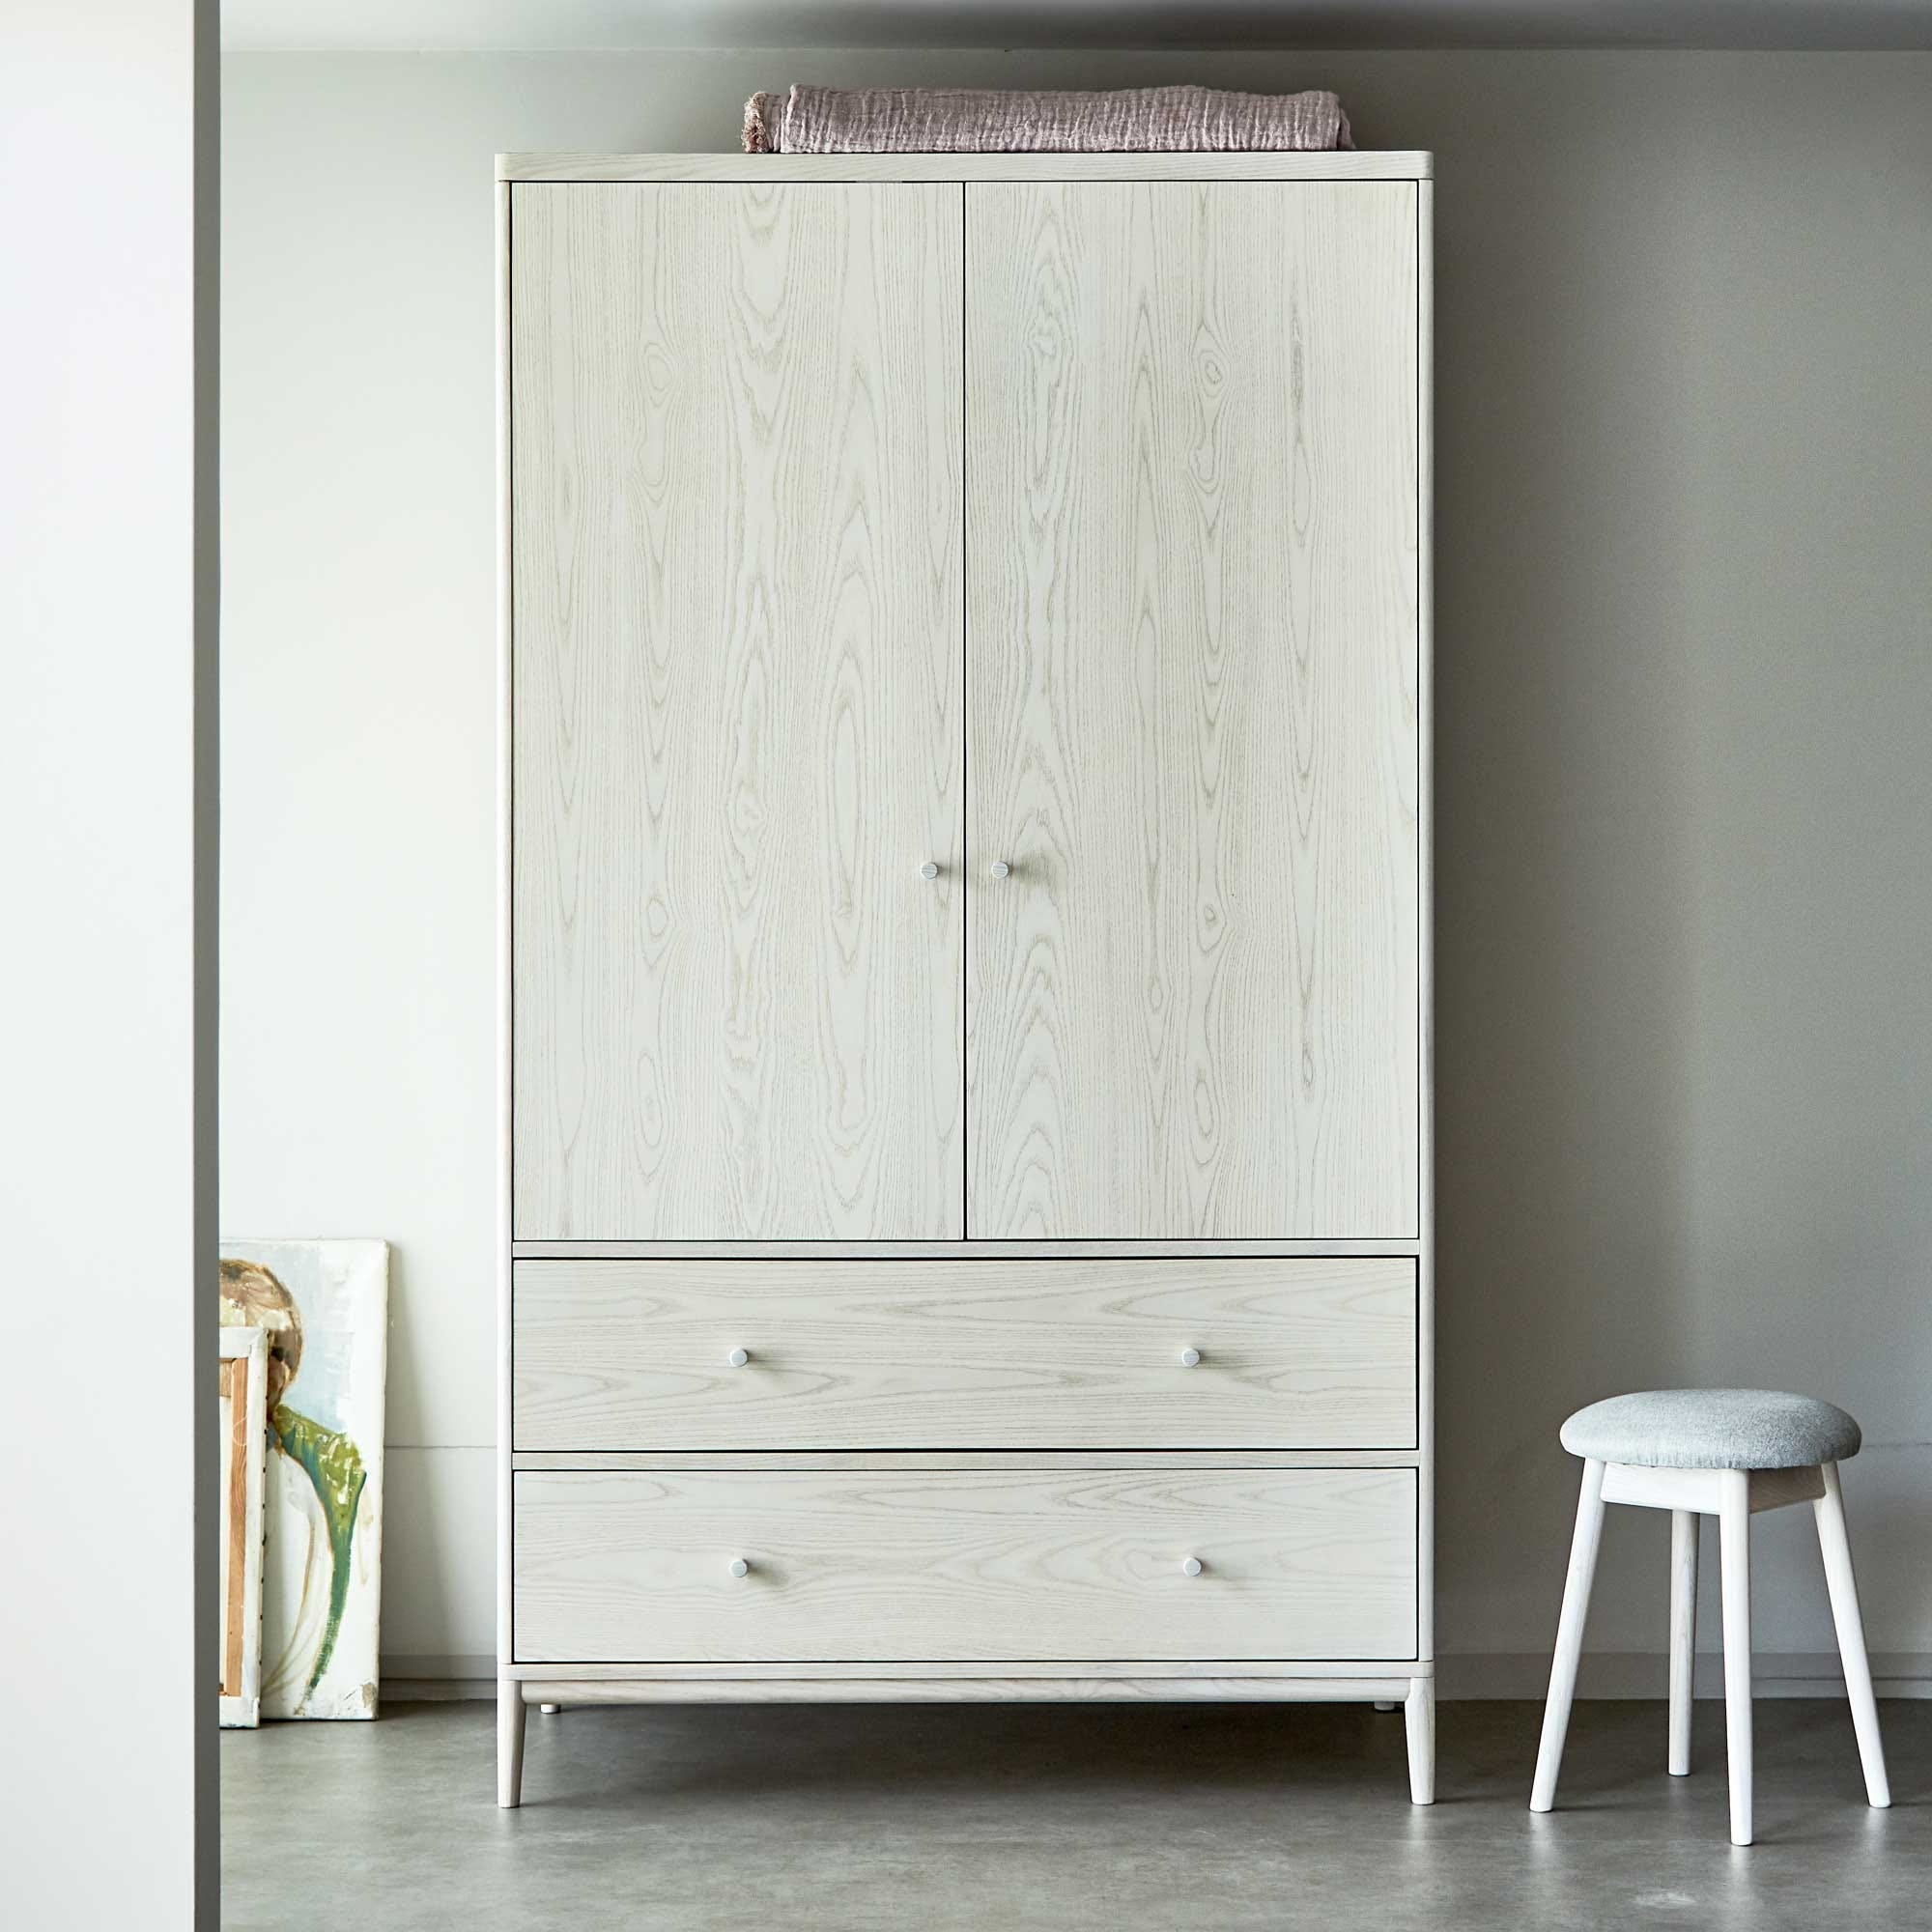 As shown in image: Salina 2 door wardrobe, Salina stool.